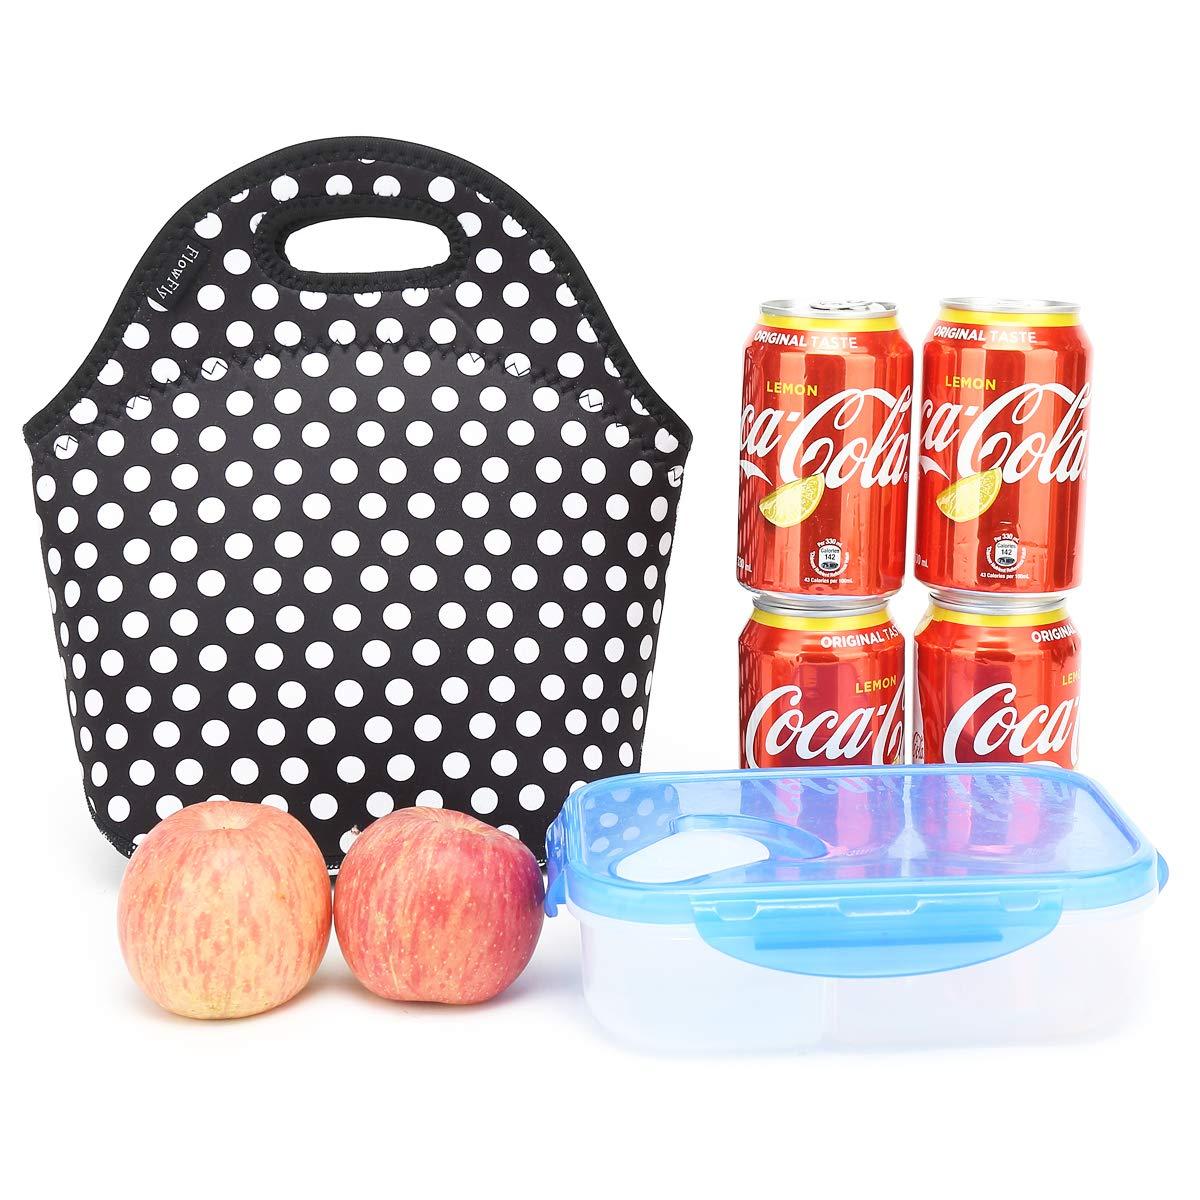 Neoprene kids Lunch box Insulated Soft Bag Mini Cooler Thermal Meal Tote Kit for Boys Girls,Men,Women,School,Work Office by FlowFly,Black